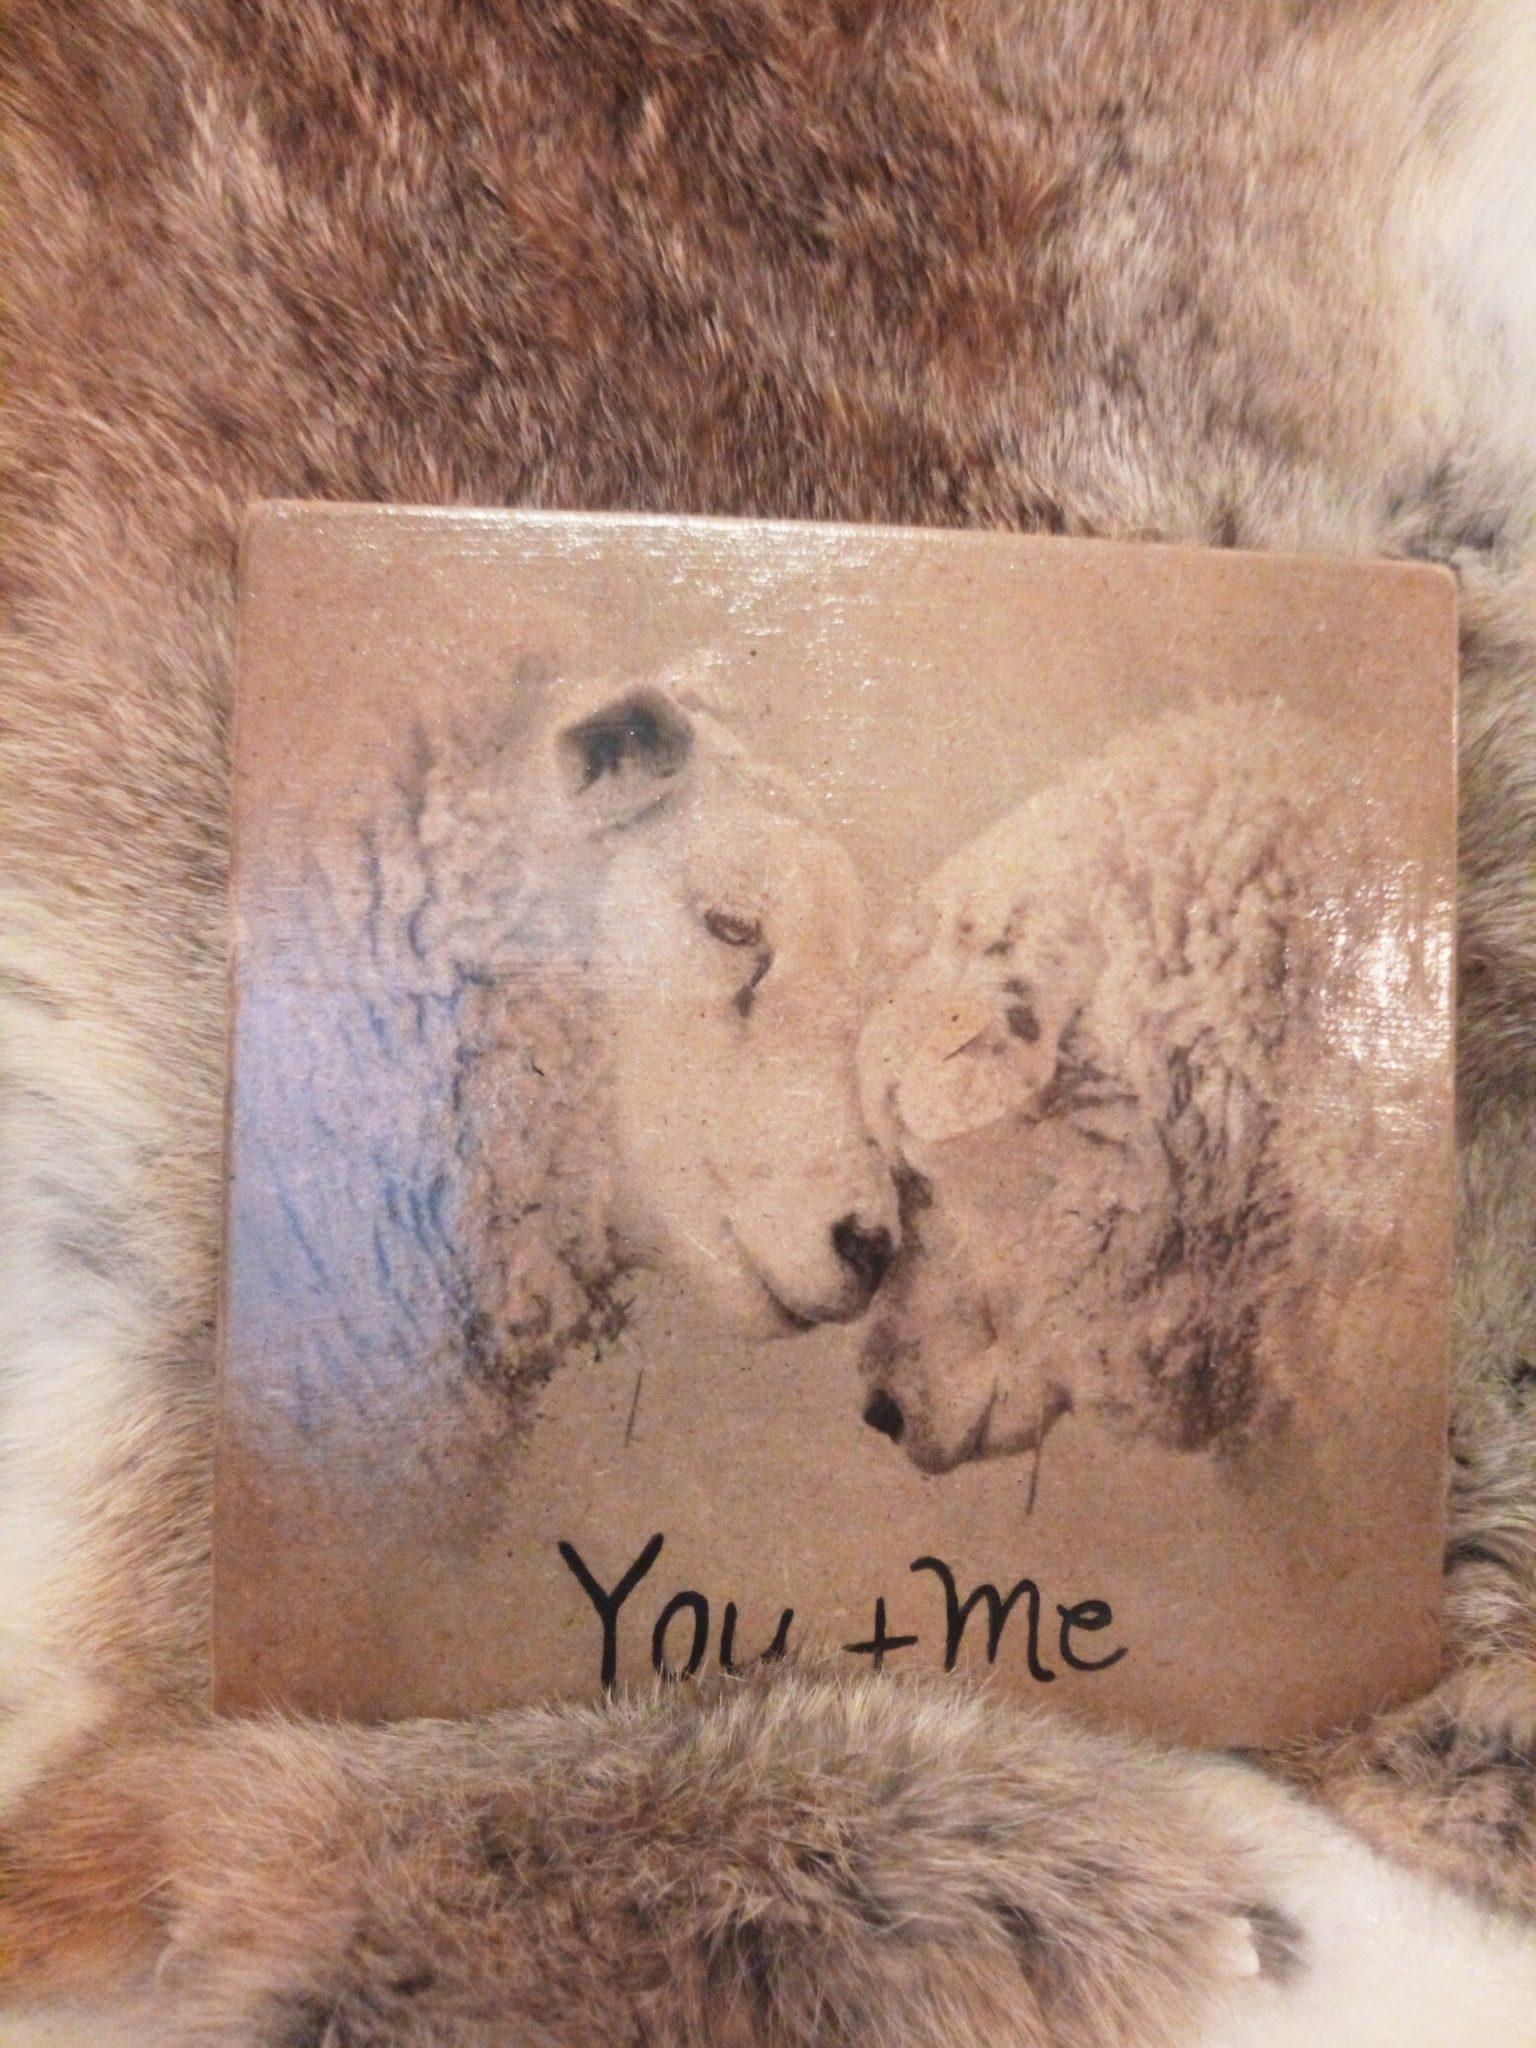 Deco-bordje: Schaap - You+me